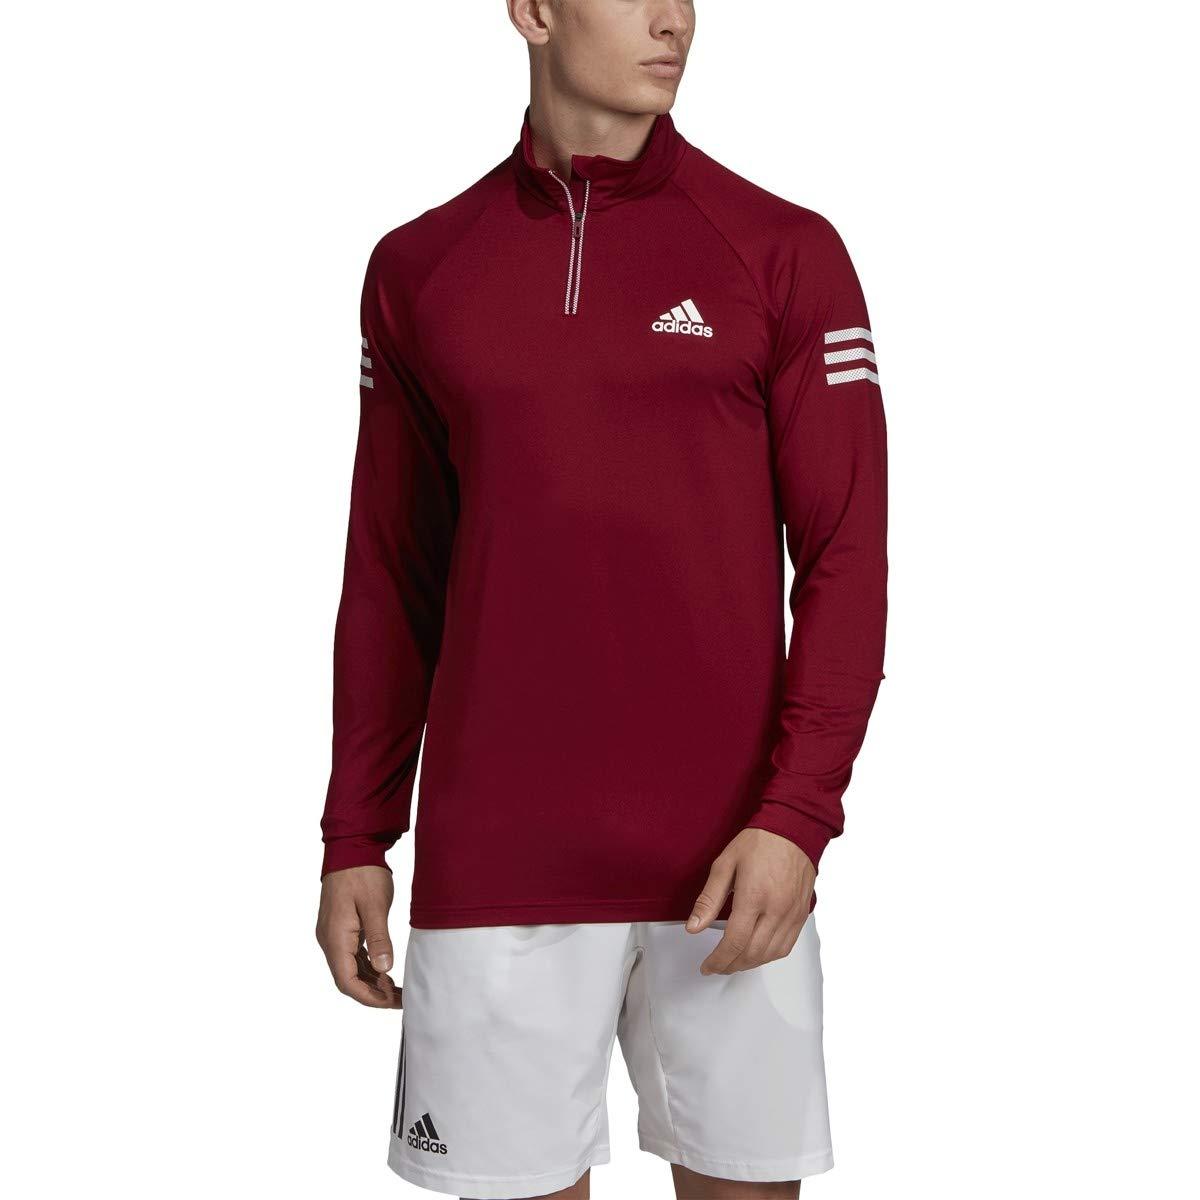 adidas Club Midlayer Tennis Sweatshirt, Collegiate Burgundy/Hi-Res Coral, Small